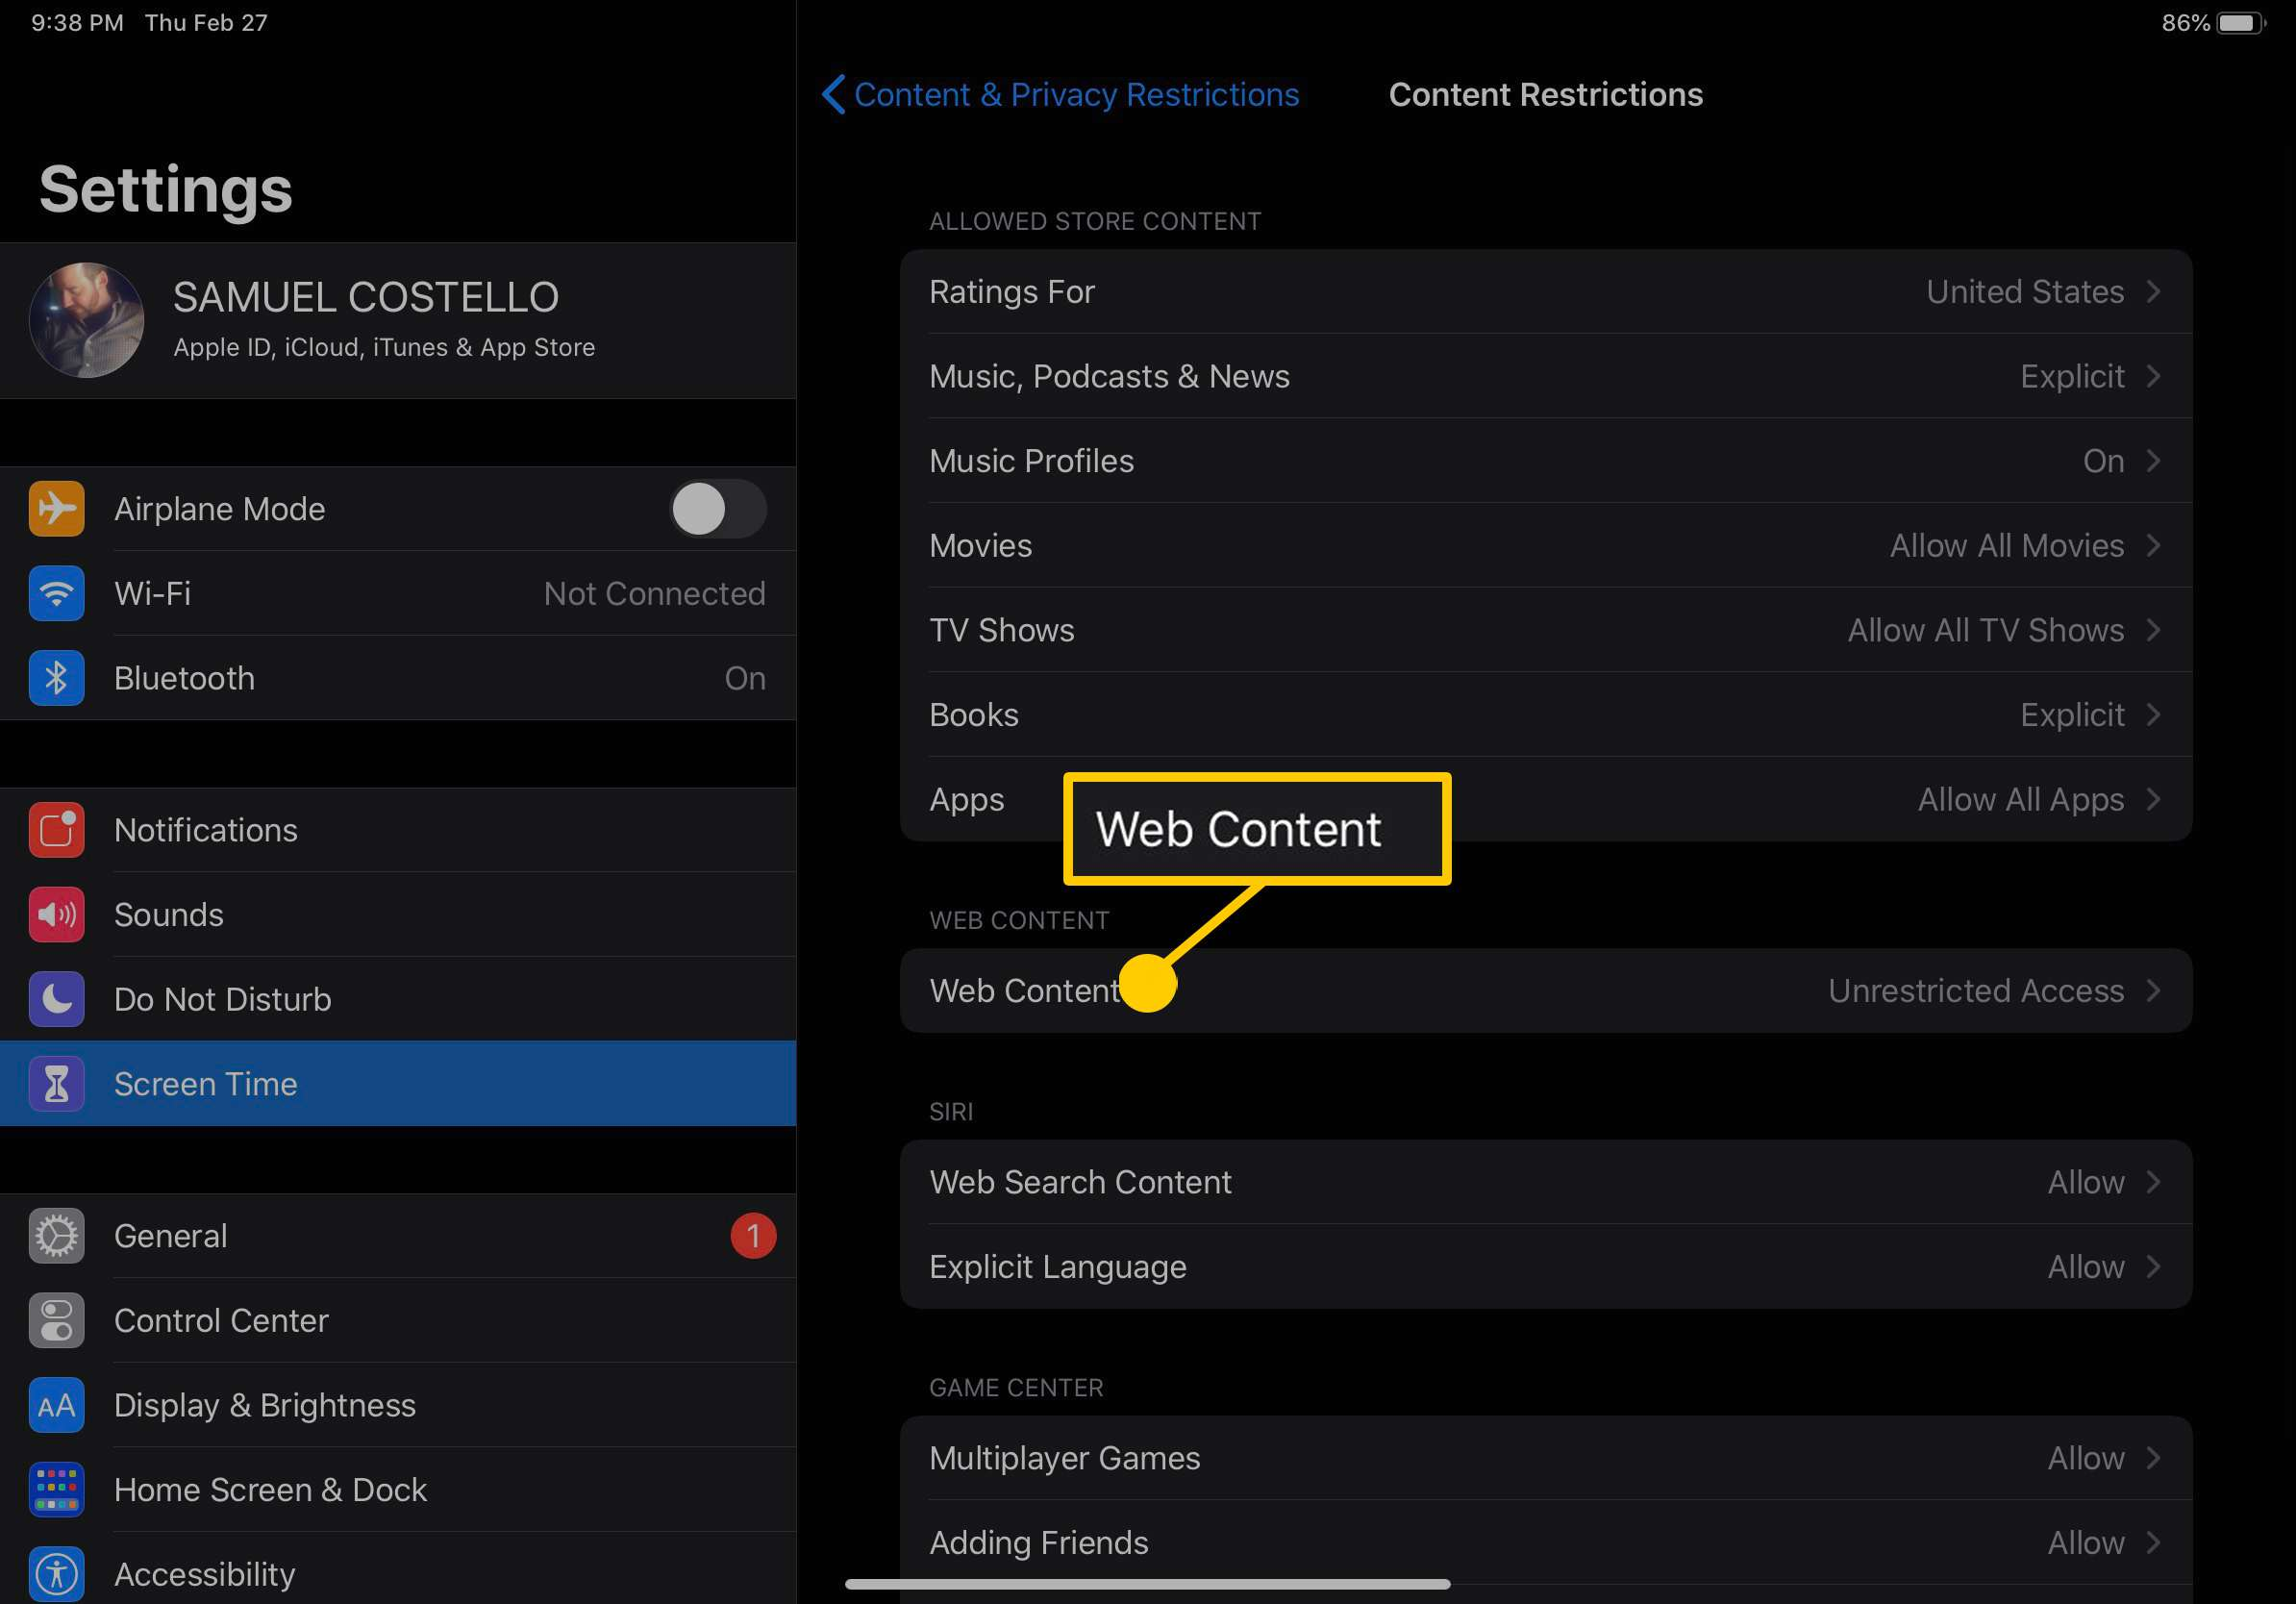 Screenshot of iPad Content Restrictions settings.